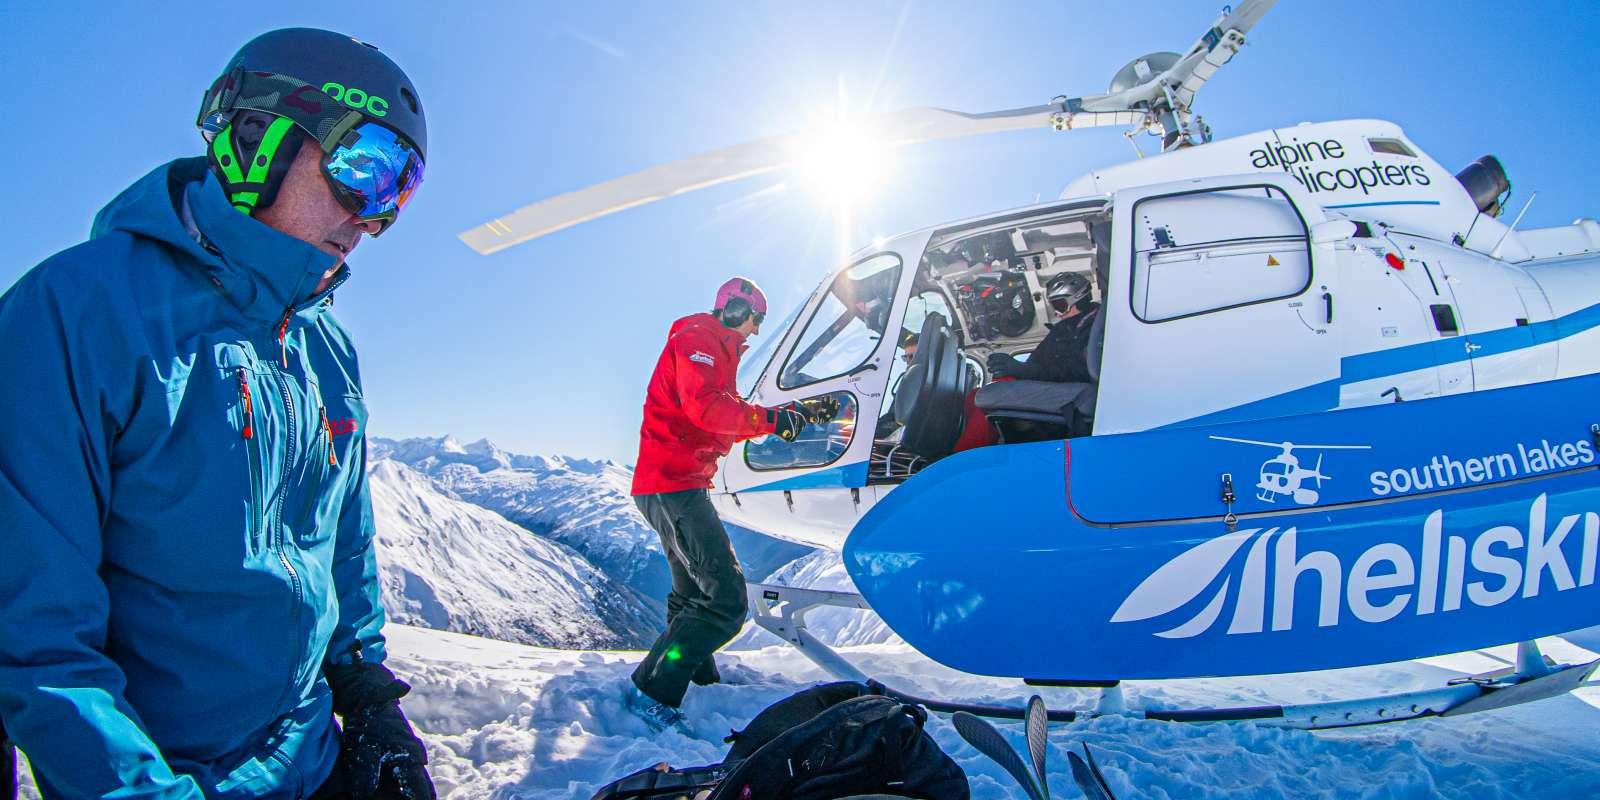 Heli Skiing with Southern Lakes Heliski